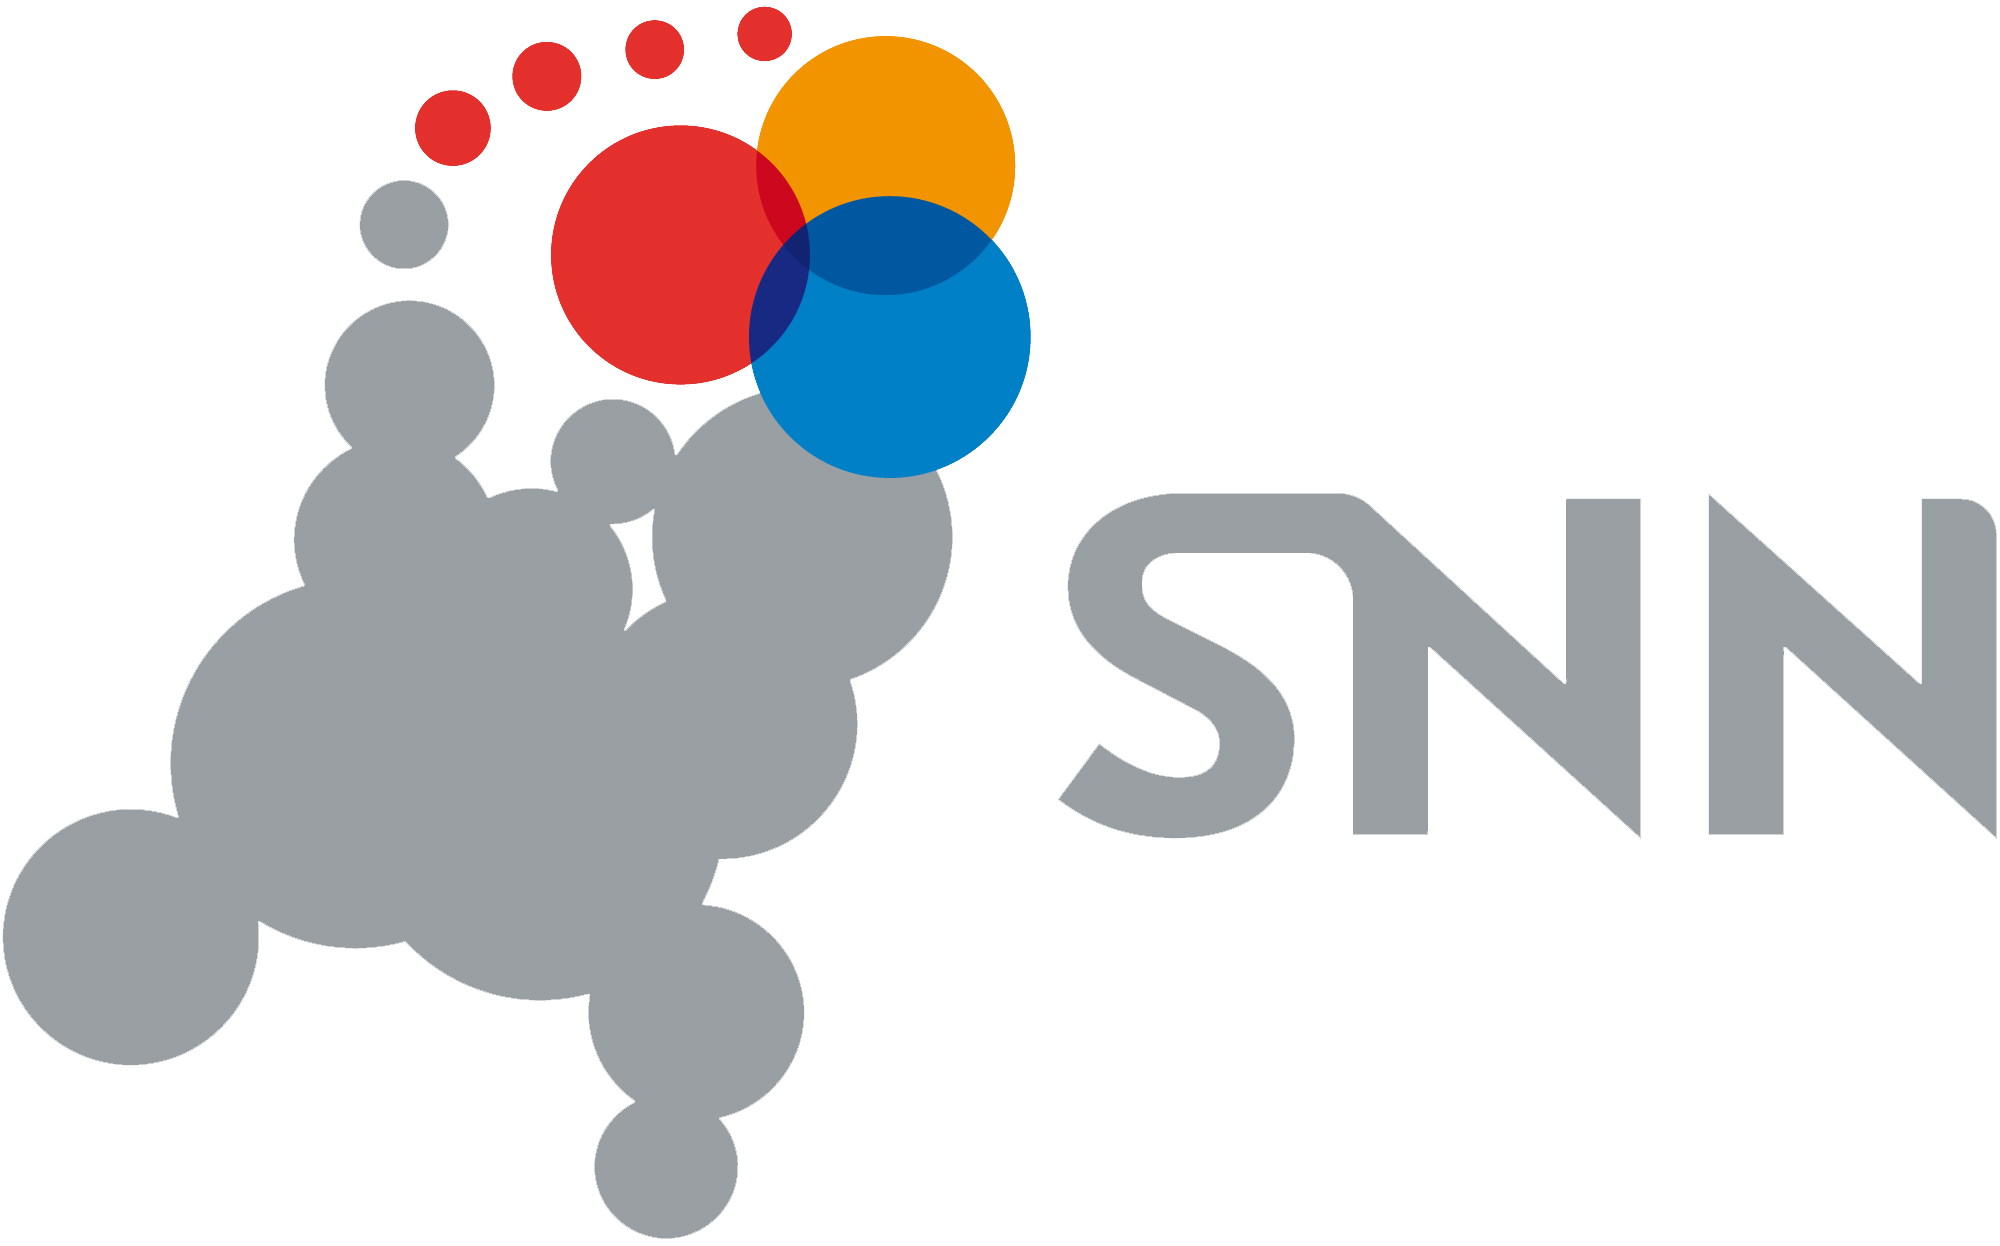 snn logo solaroilsystems